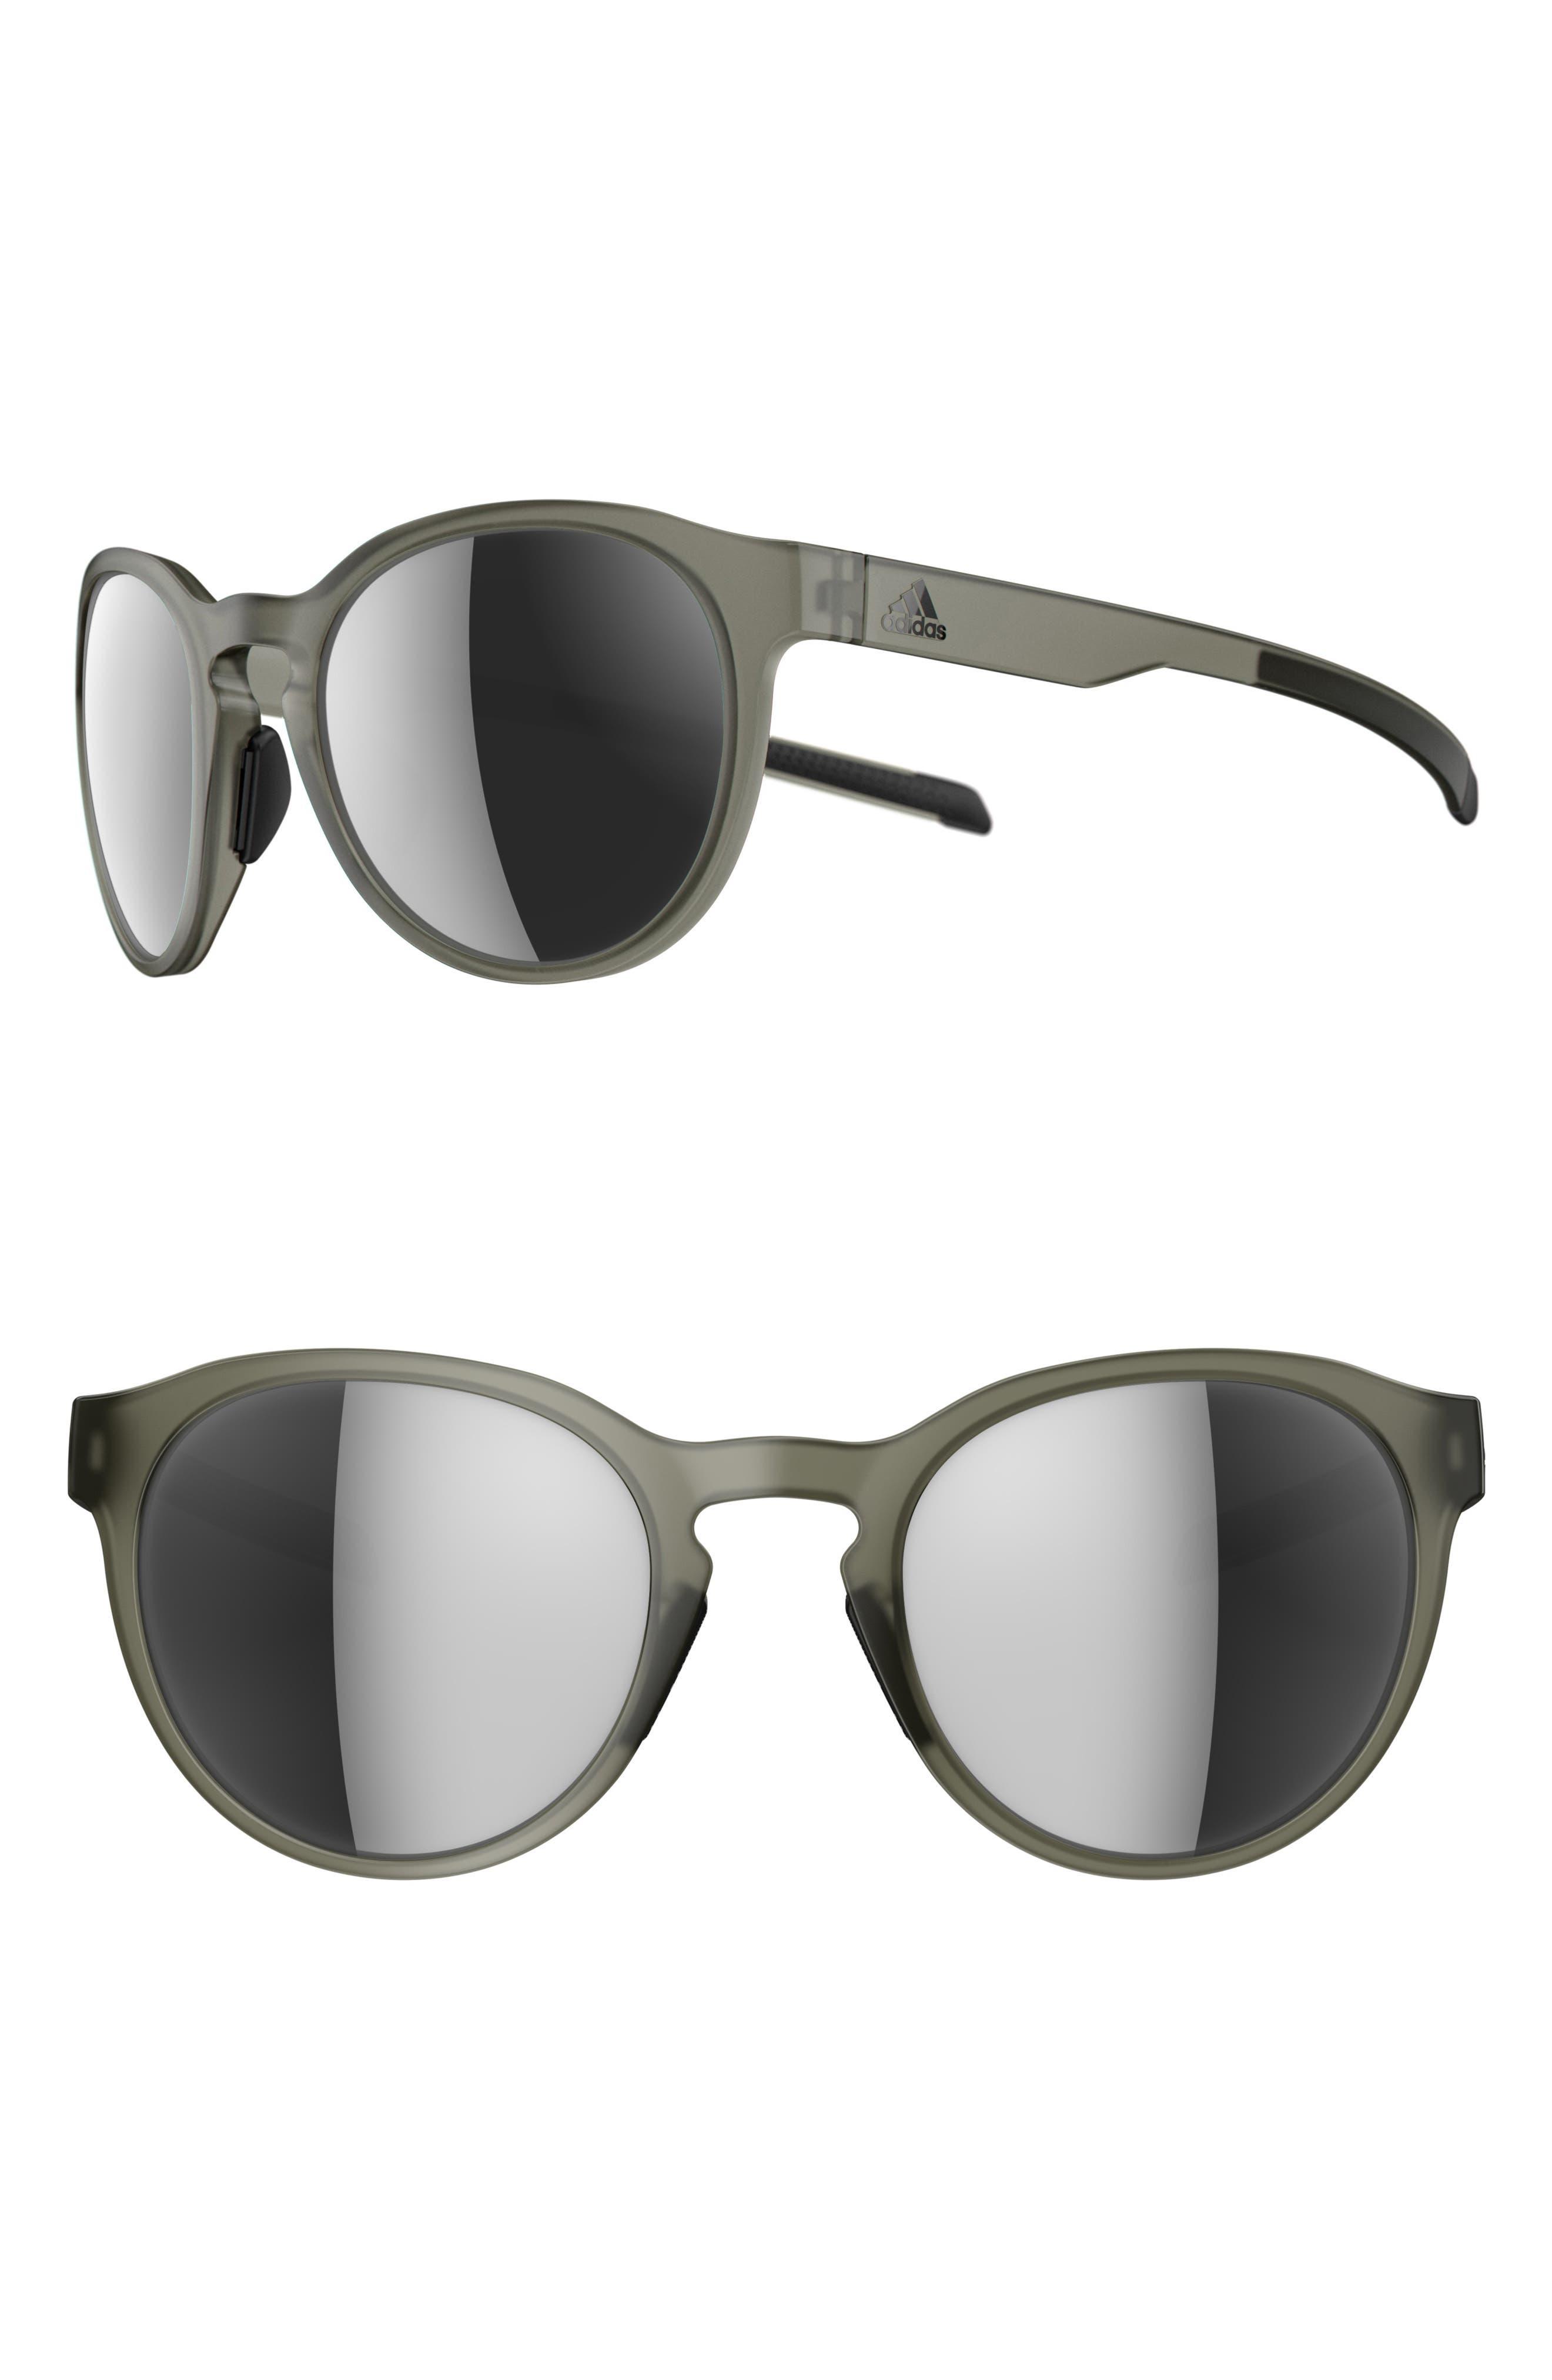 Proshift 52mm Mirrored Sport Sunglasses,                         Main,                         color, MATTE OLIVE/ CHROME